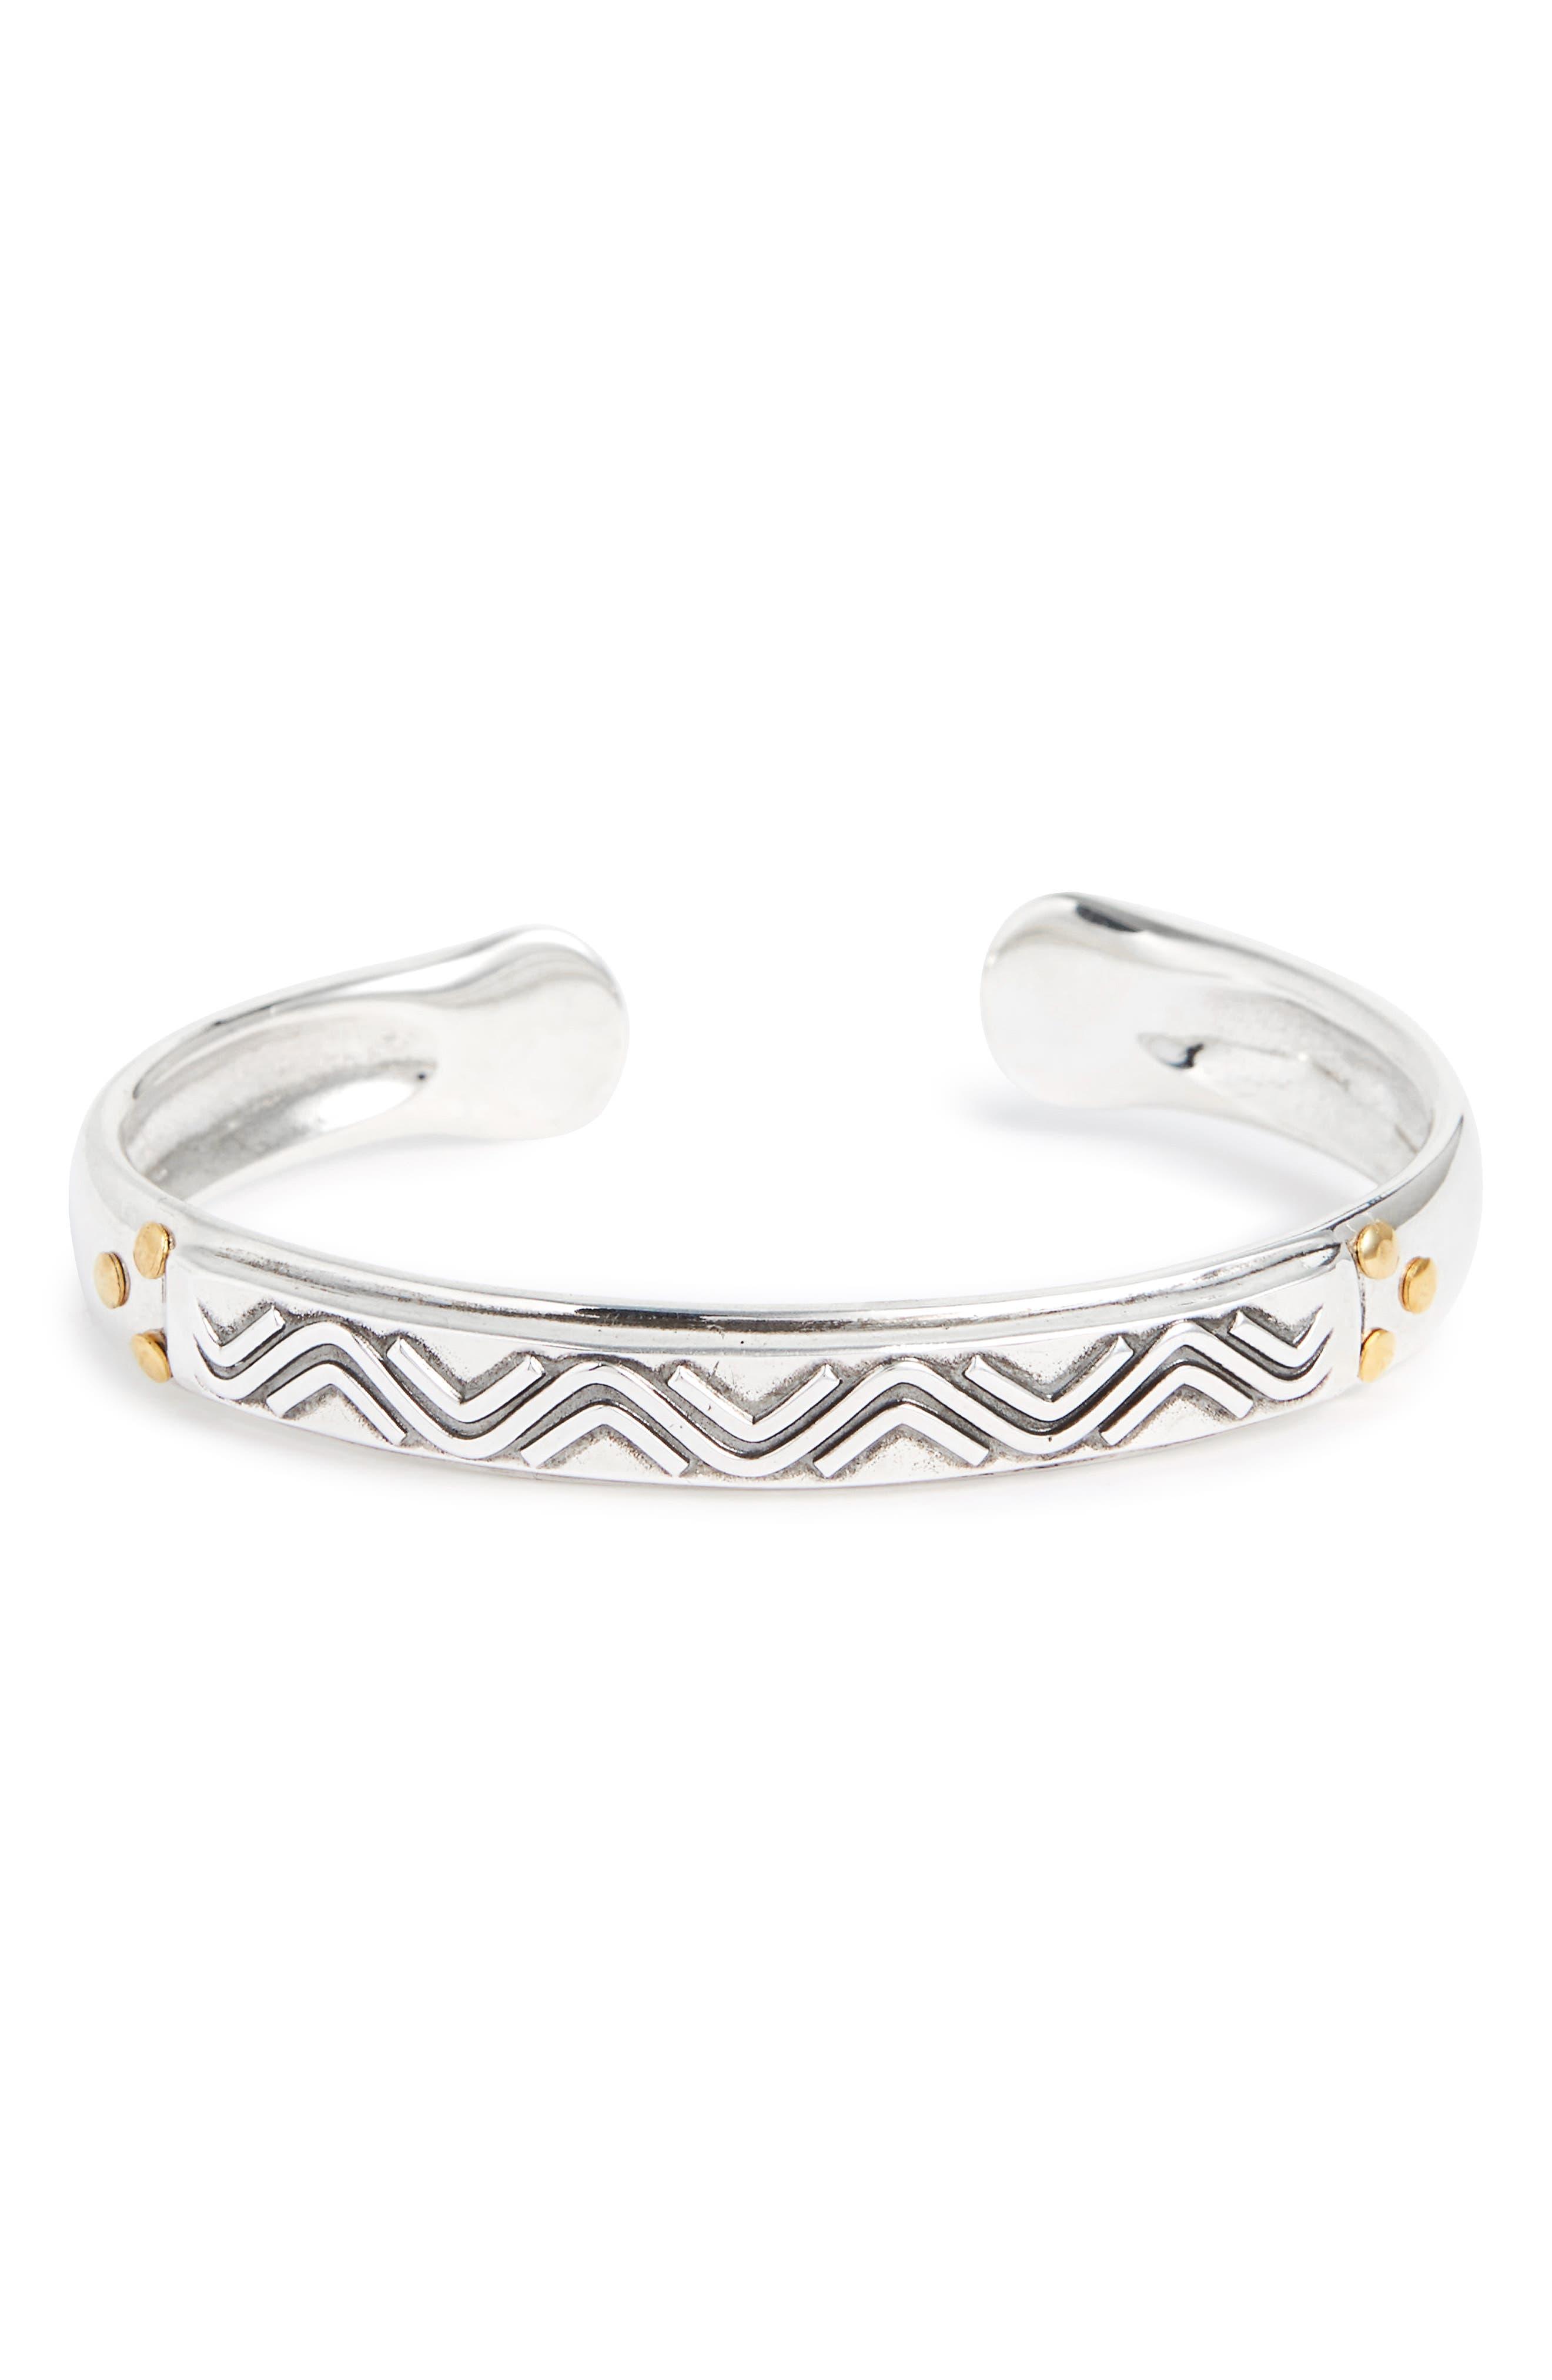 Matis Cuff Bracelet,                         Main,                         color, 040